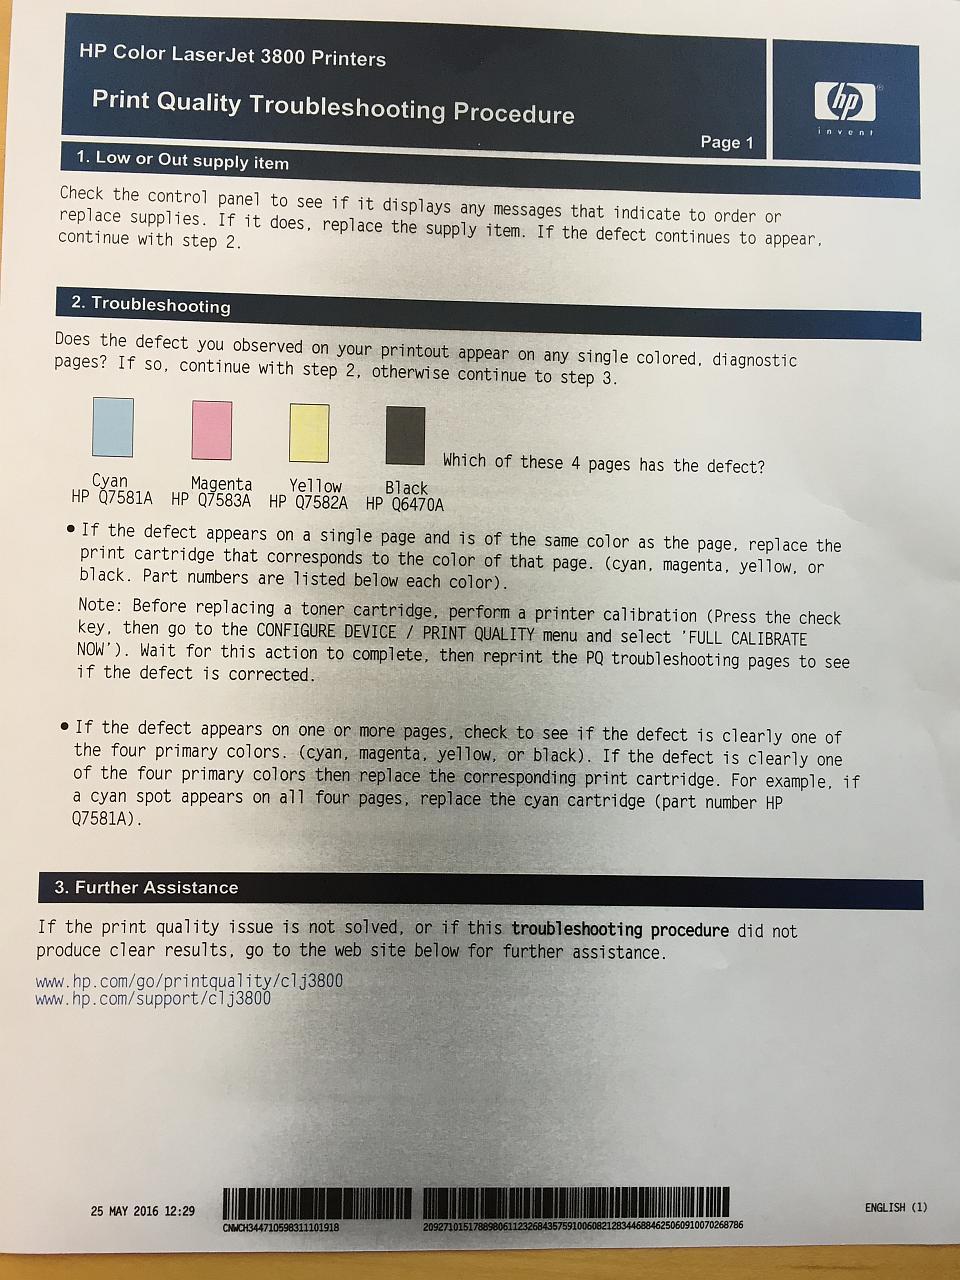 HP Laser Jet P2055dn: Black spots on paper - eehelp com